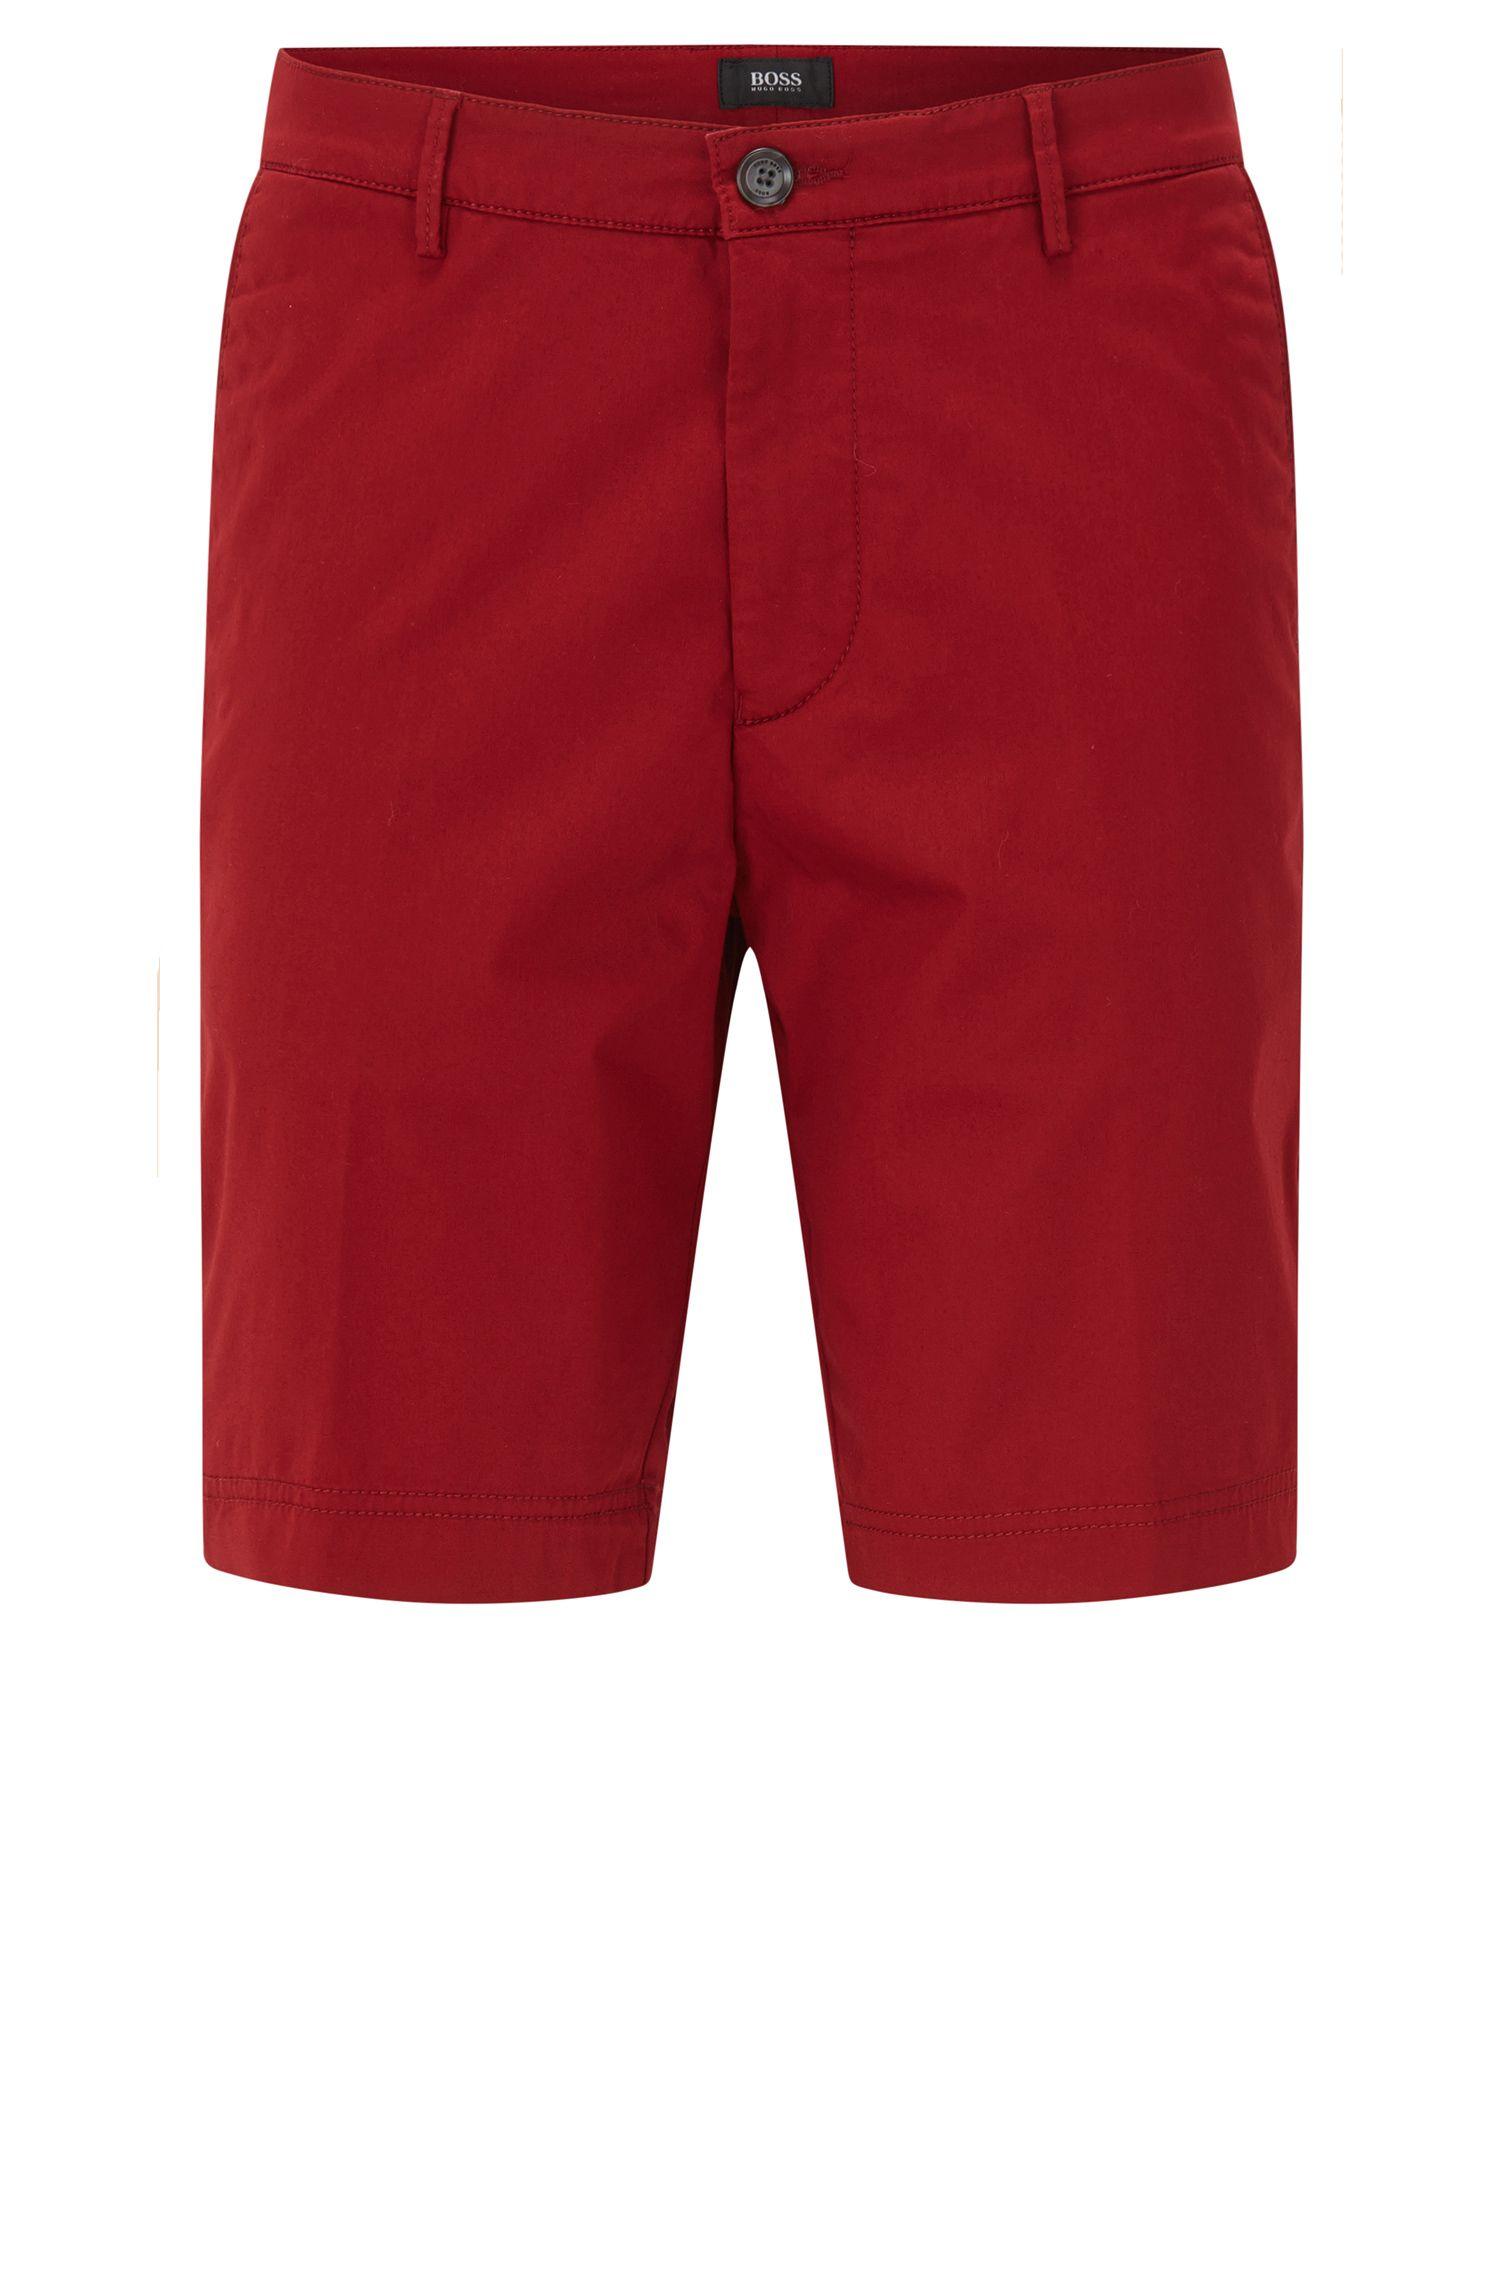 Shorts regular fit en algodón elástico mercerizado